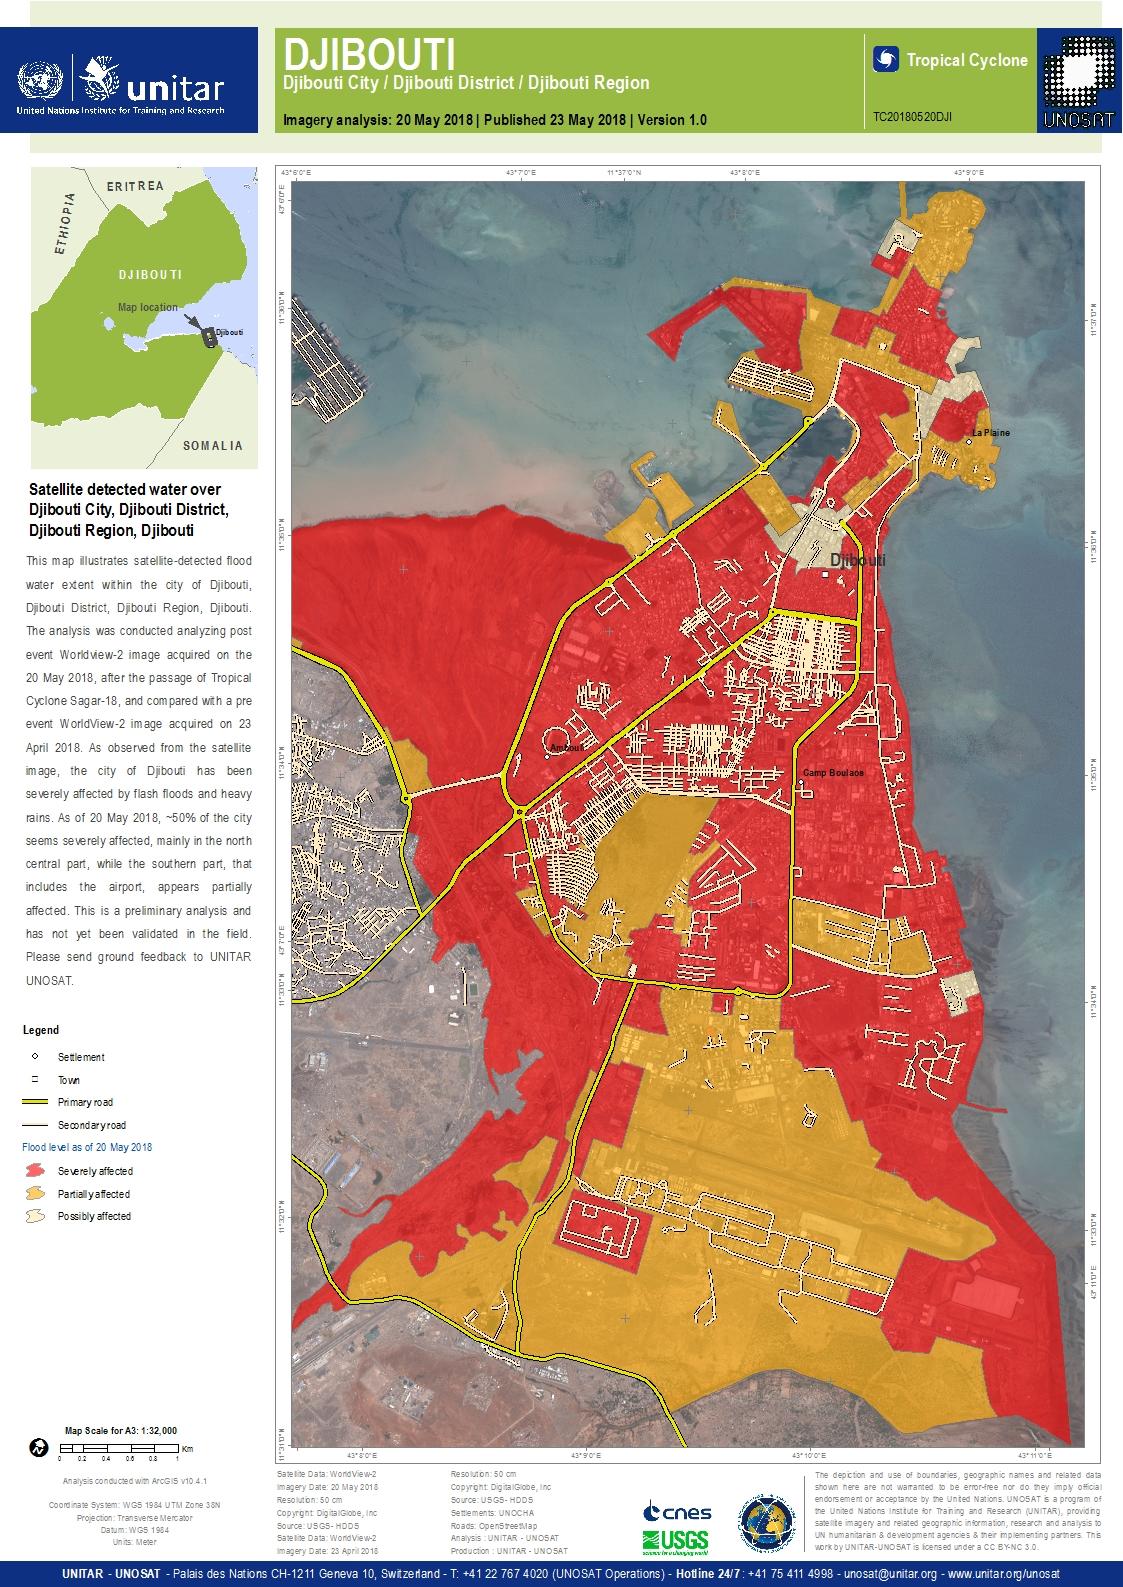 Satellite Detected Water over Djibouti City, Djibouti ... on topo map of djibouti, political map of djibouti, sports of djibouti, detailed map of djibouti, terrain map of djibouti, outline map of djibouti, blank map of djibouti, world map of djibouti, street map of djibouti, physical map of djibouti, topographical map of djibouti,